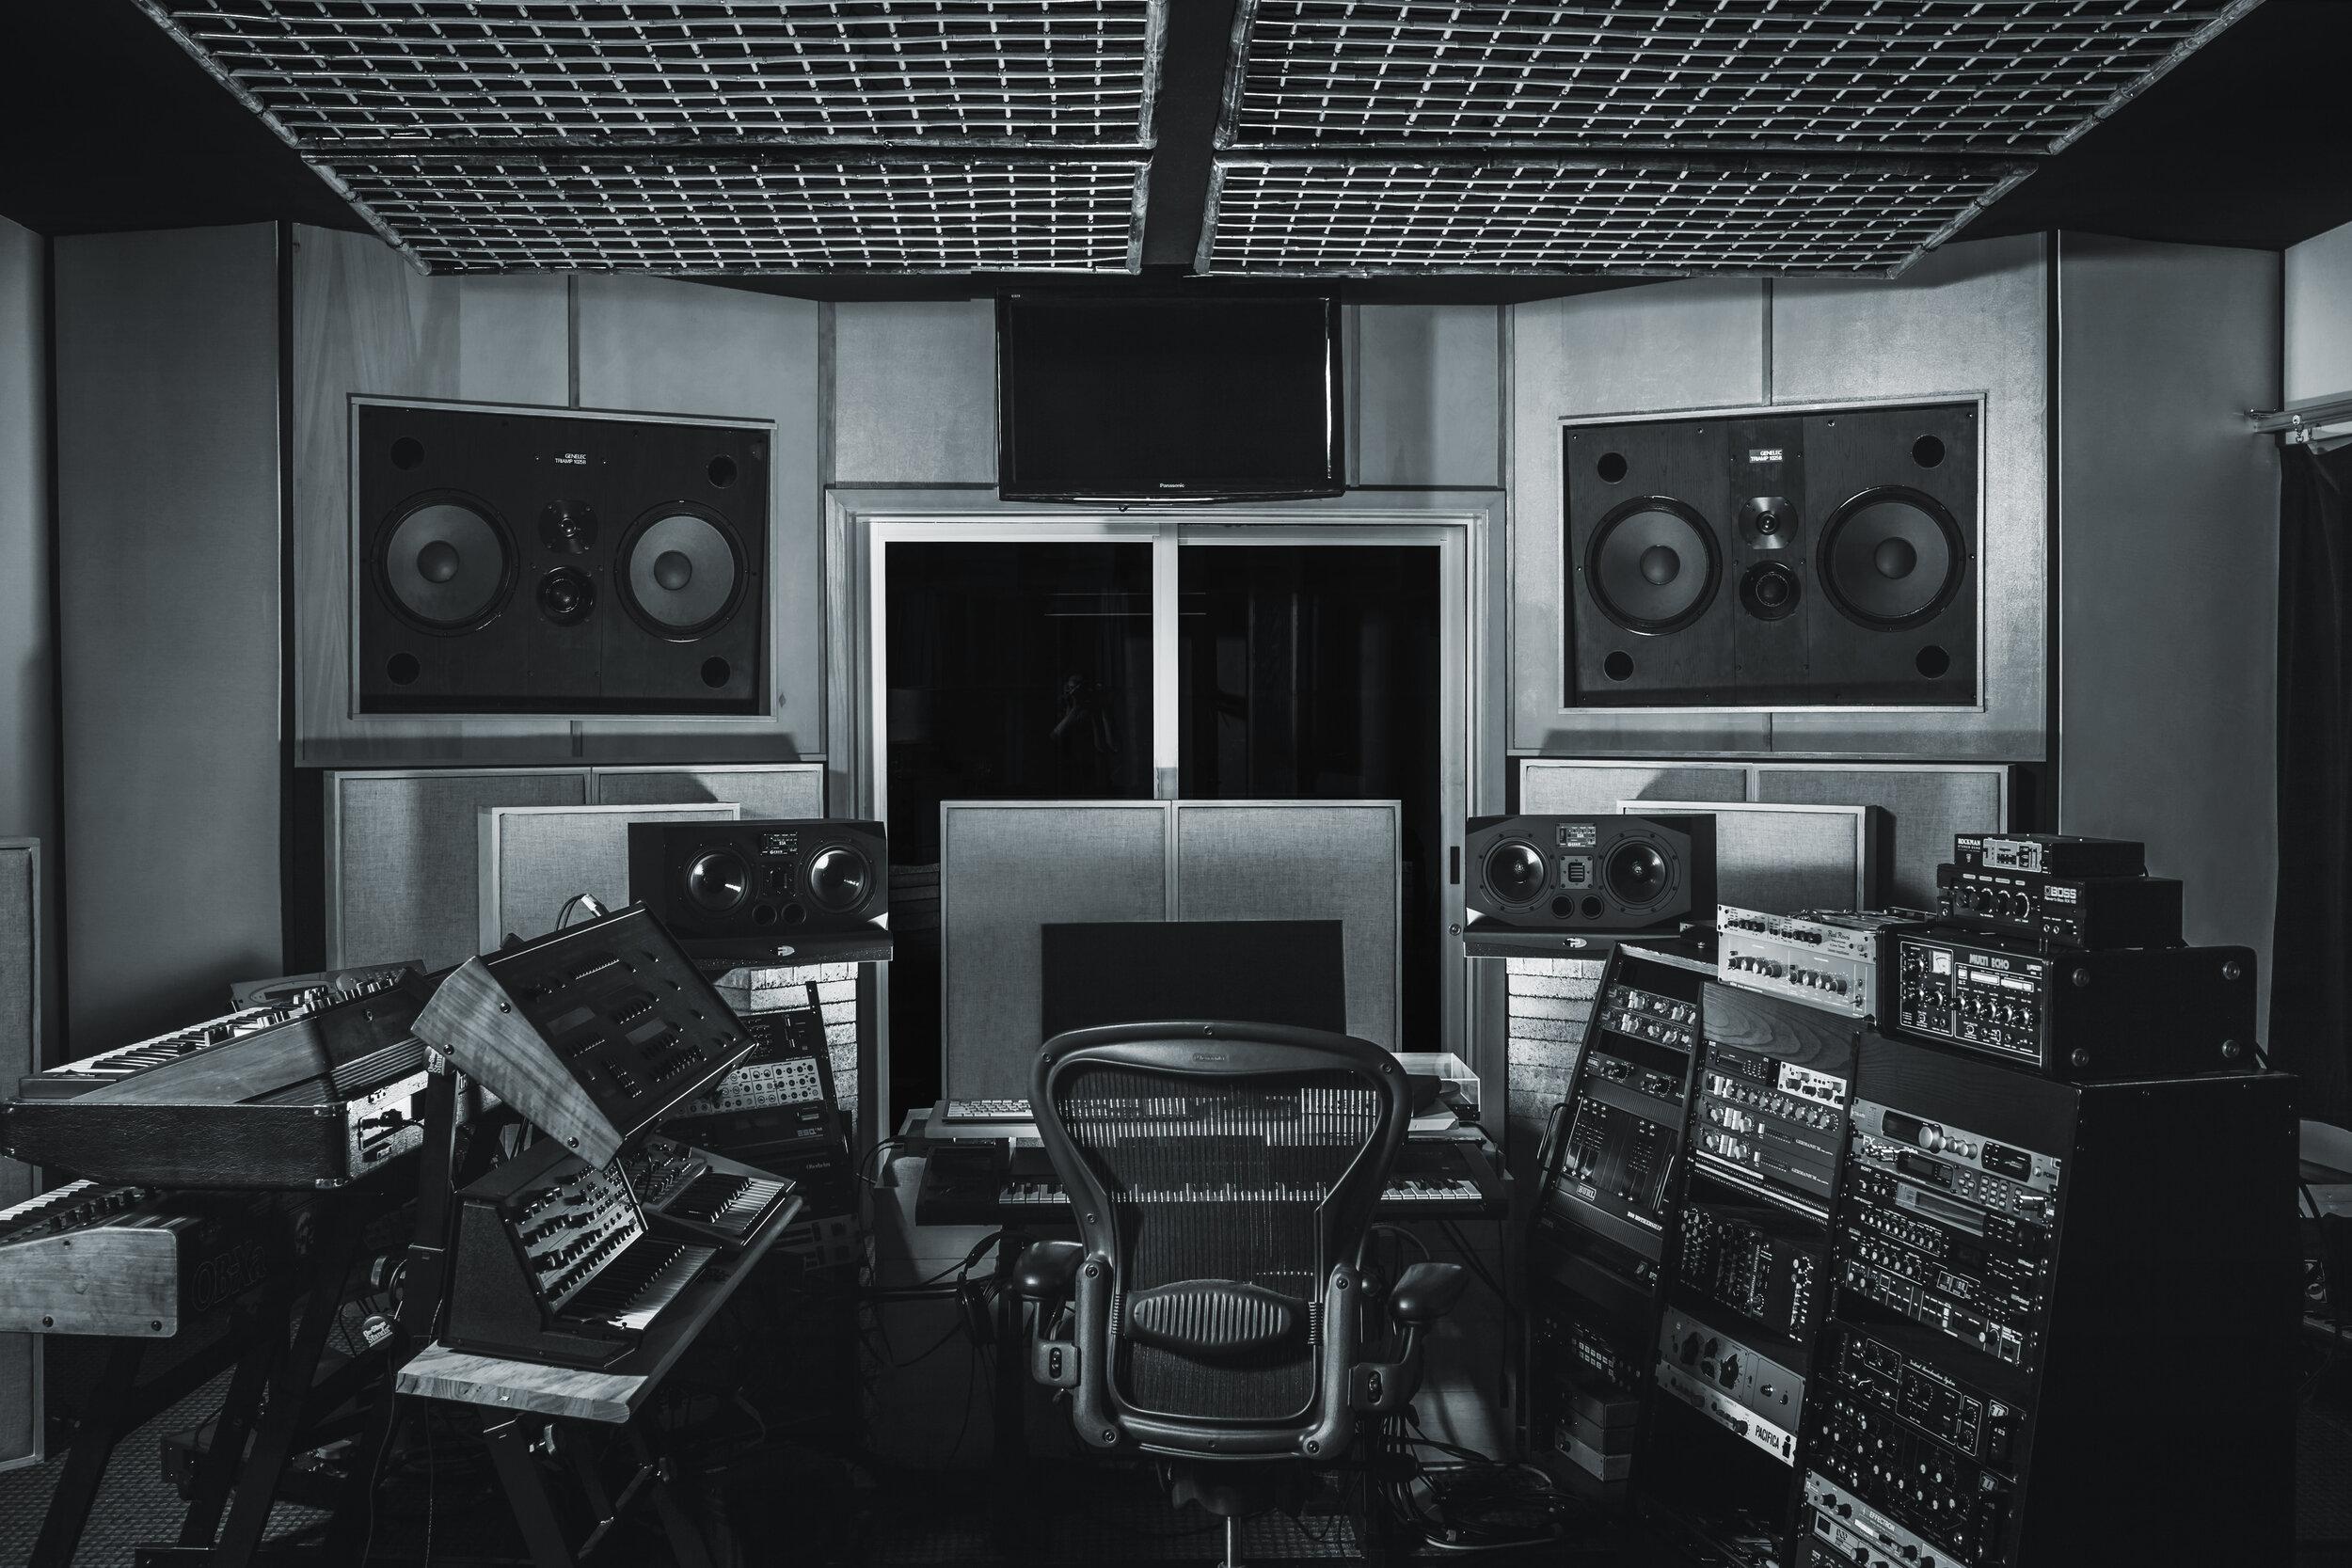 032617_Helio_Sound_studio2694_L_BW.jpg